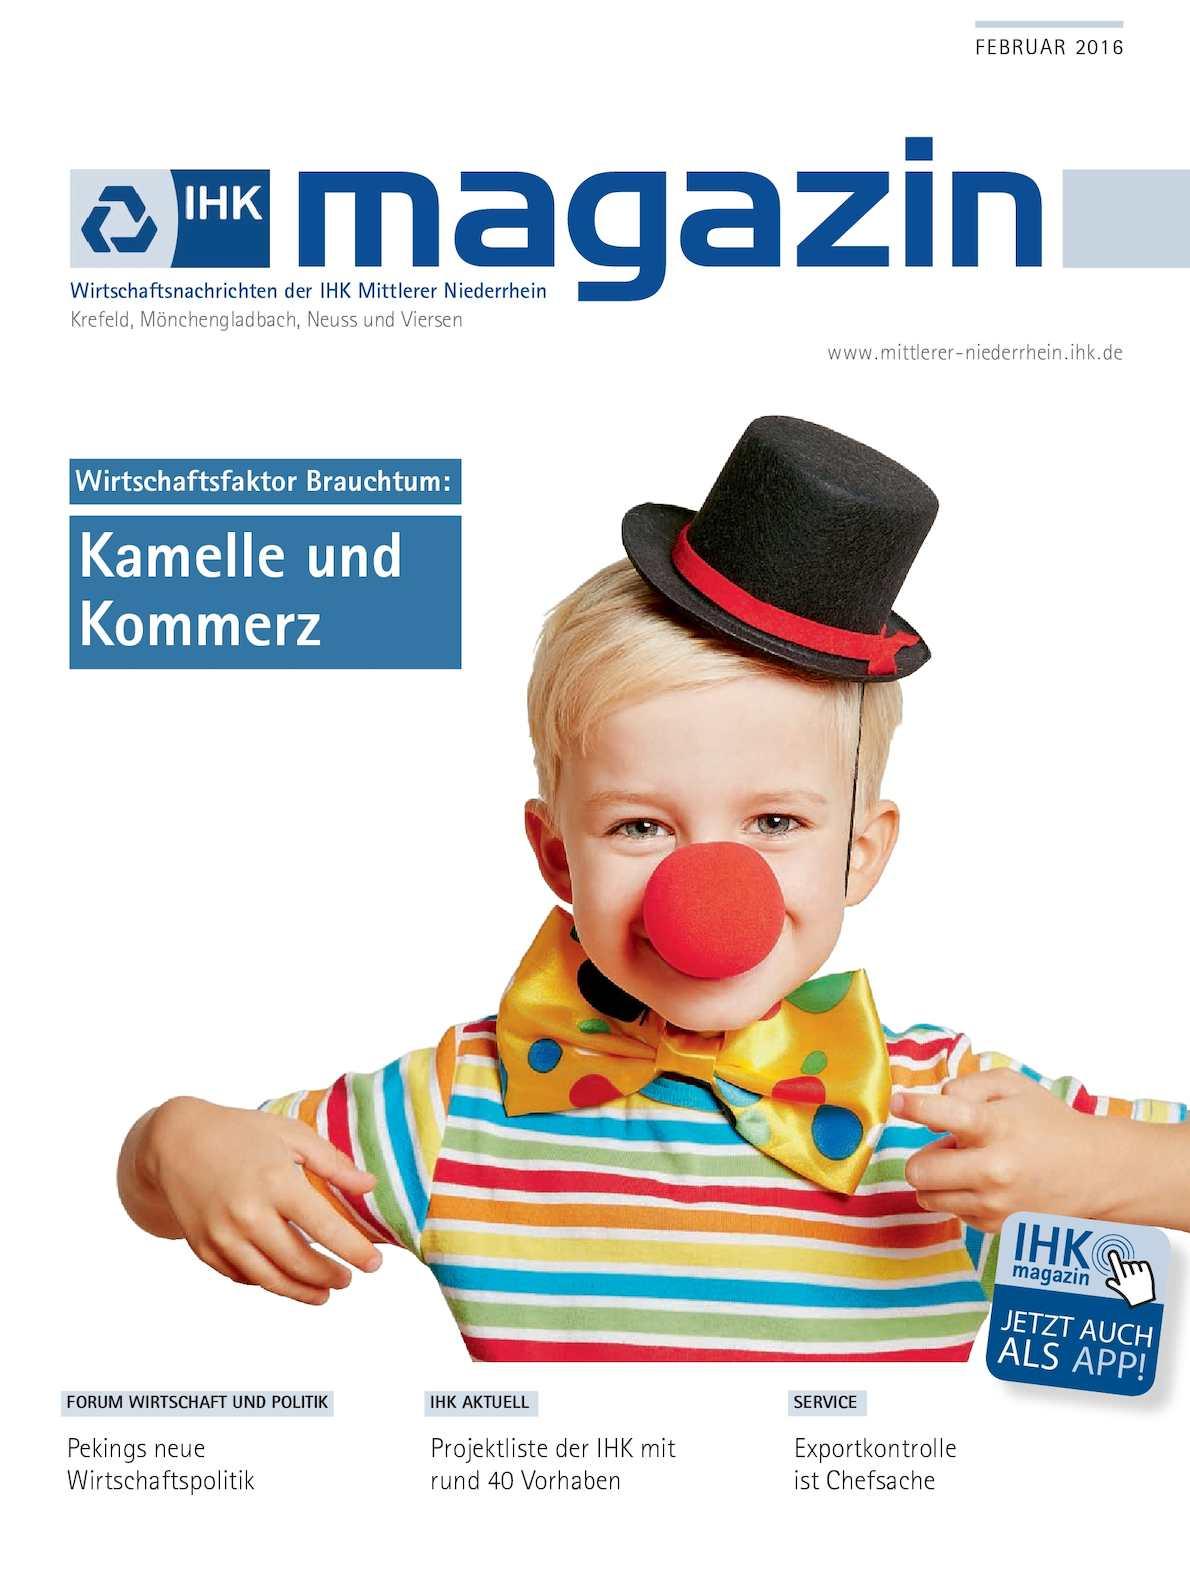 9523a3866c18d2 Calaméo - IHK Magazin Februar 2016